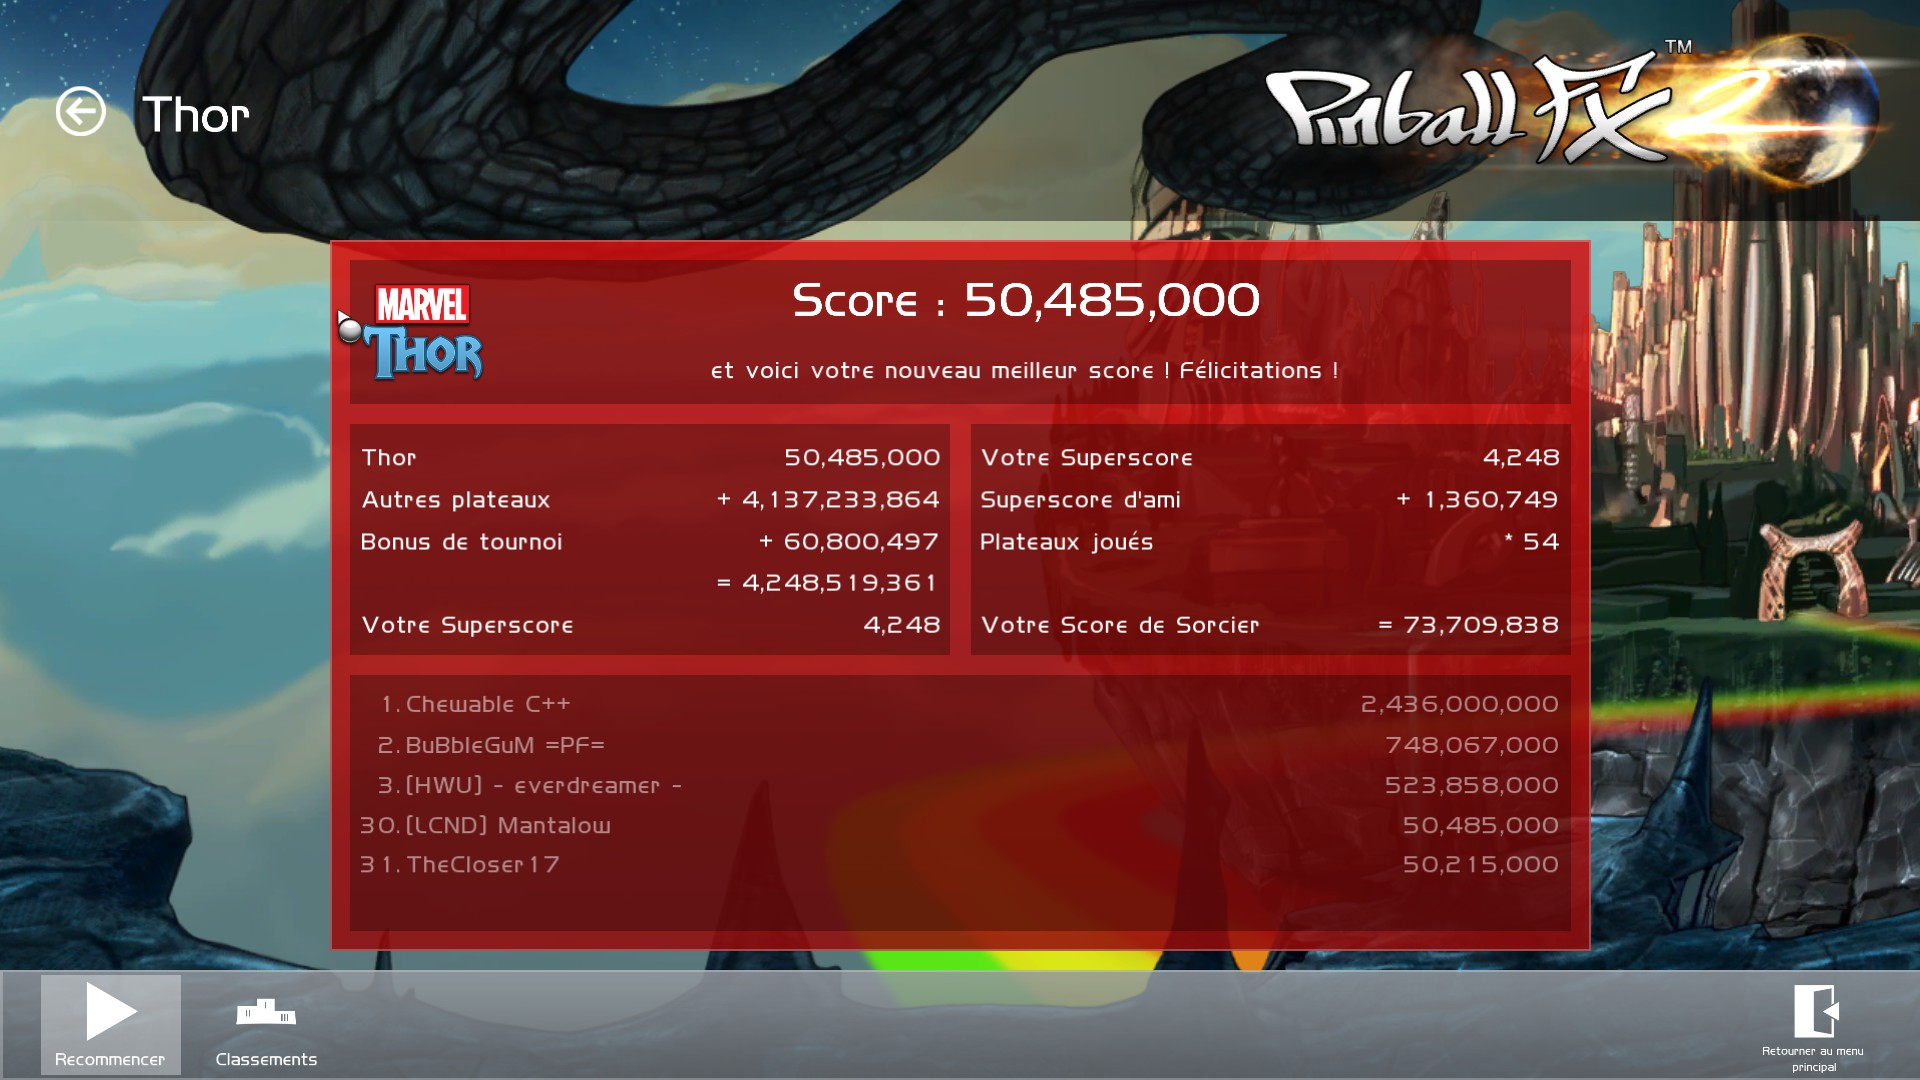 Mantalow: Pinball FX 2: Marvel: Thor (PC) 50,485,000 points on 2015-07-22 04:45:05